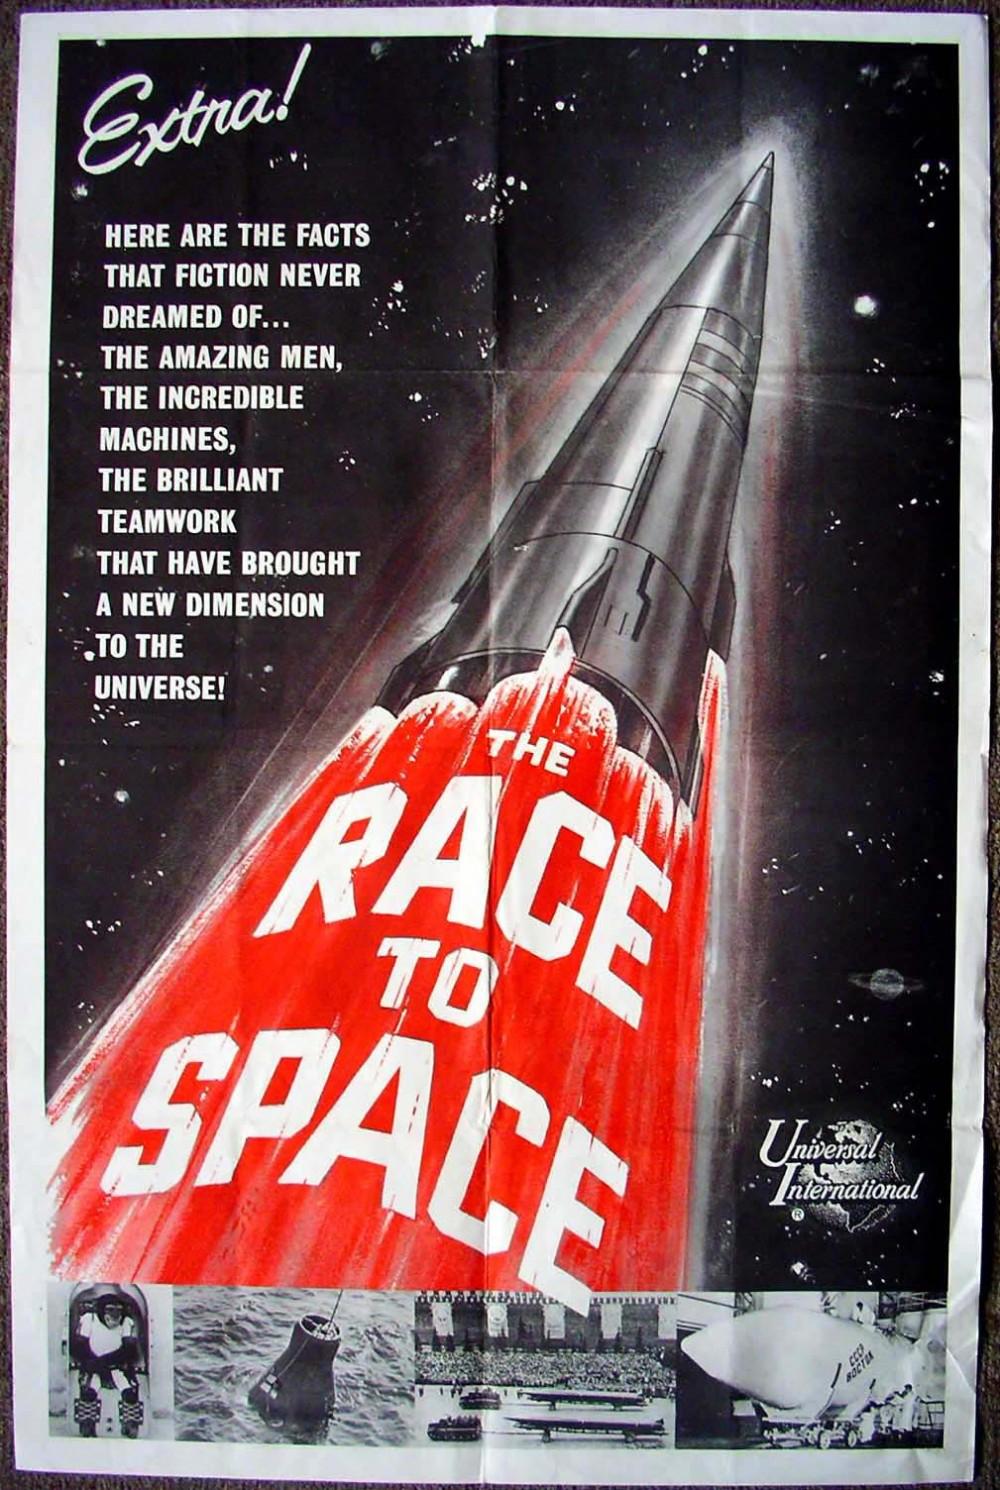 Space Race Propaganda Race-to-space